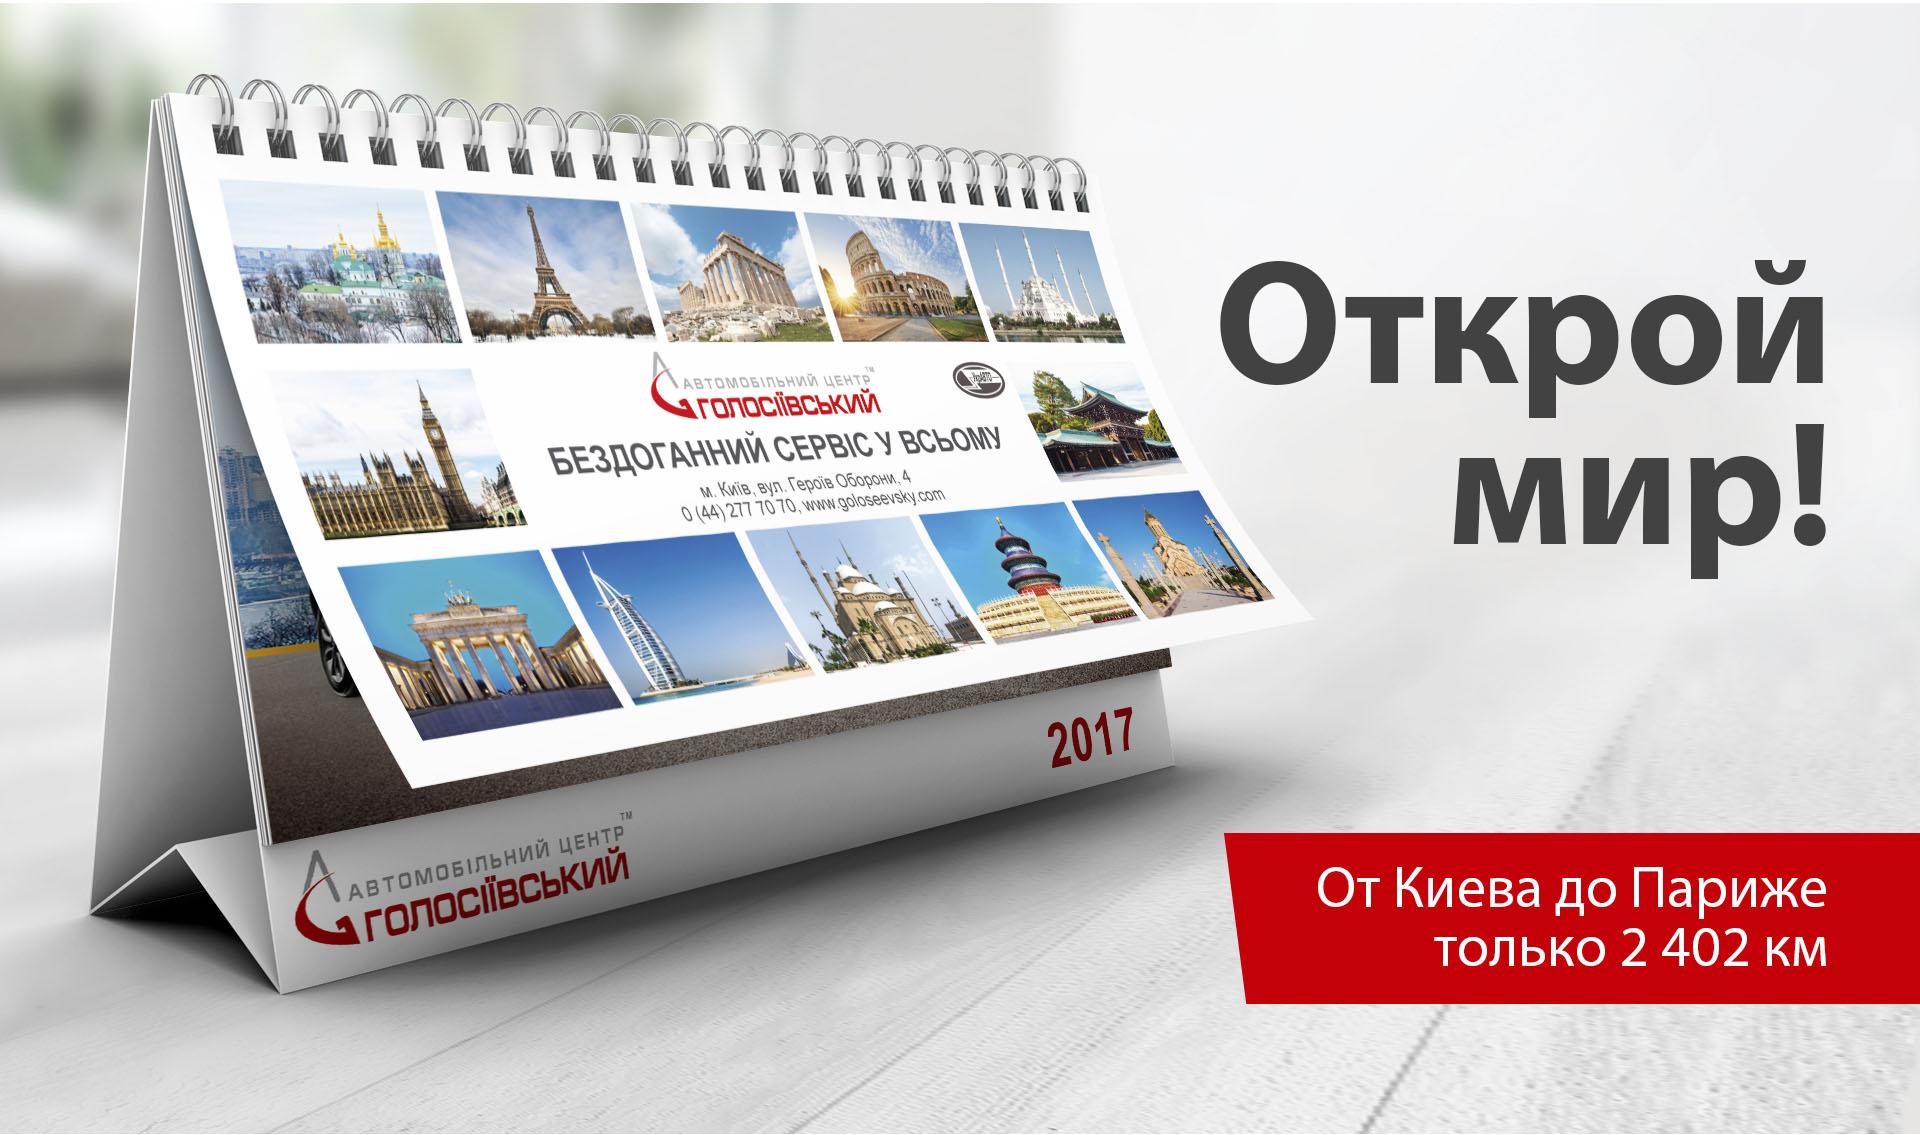 Autocentr_Goloseevsky_banner_2